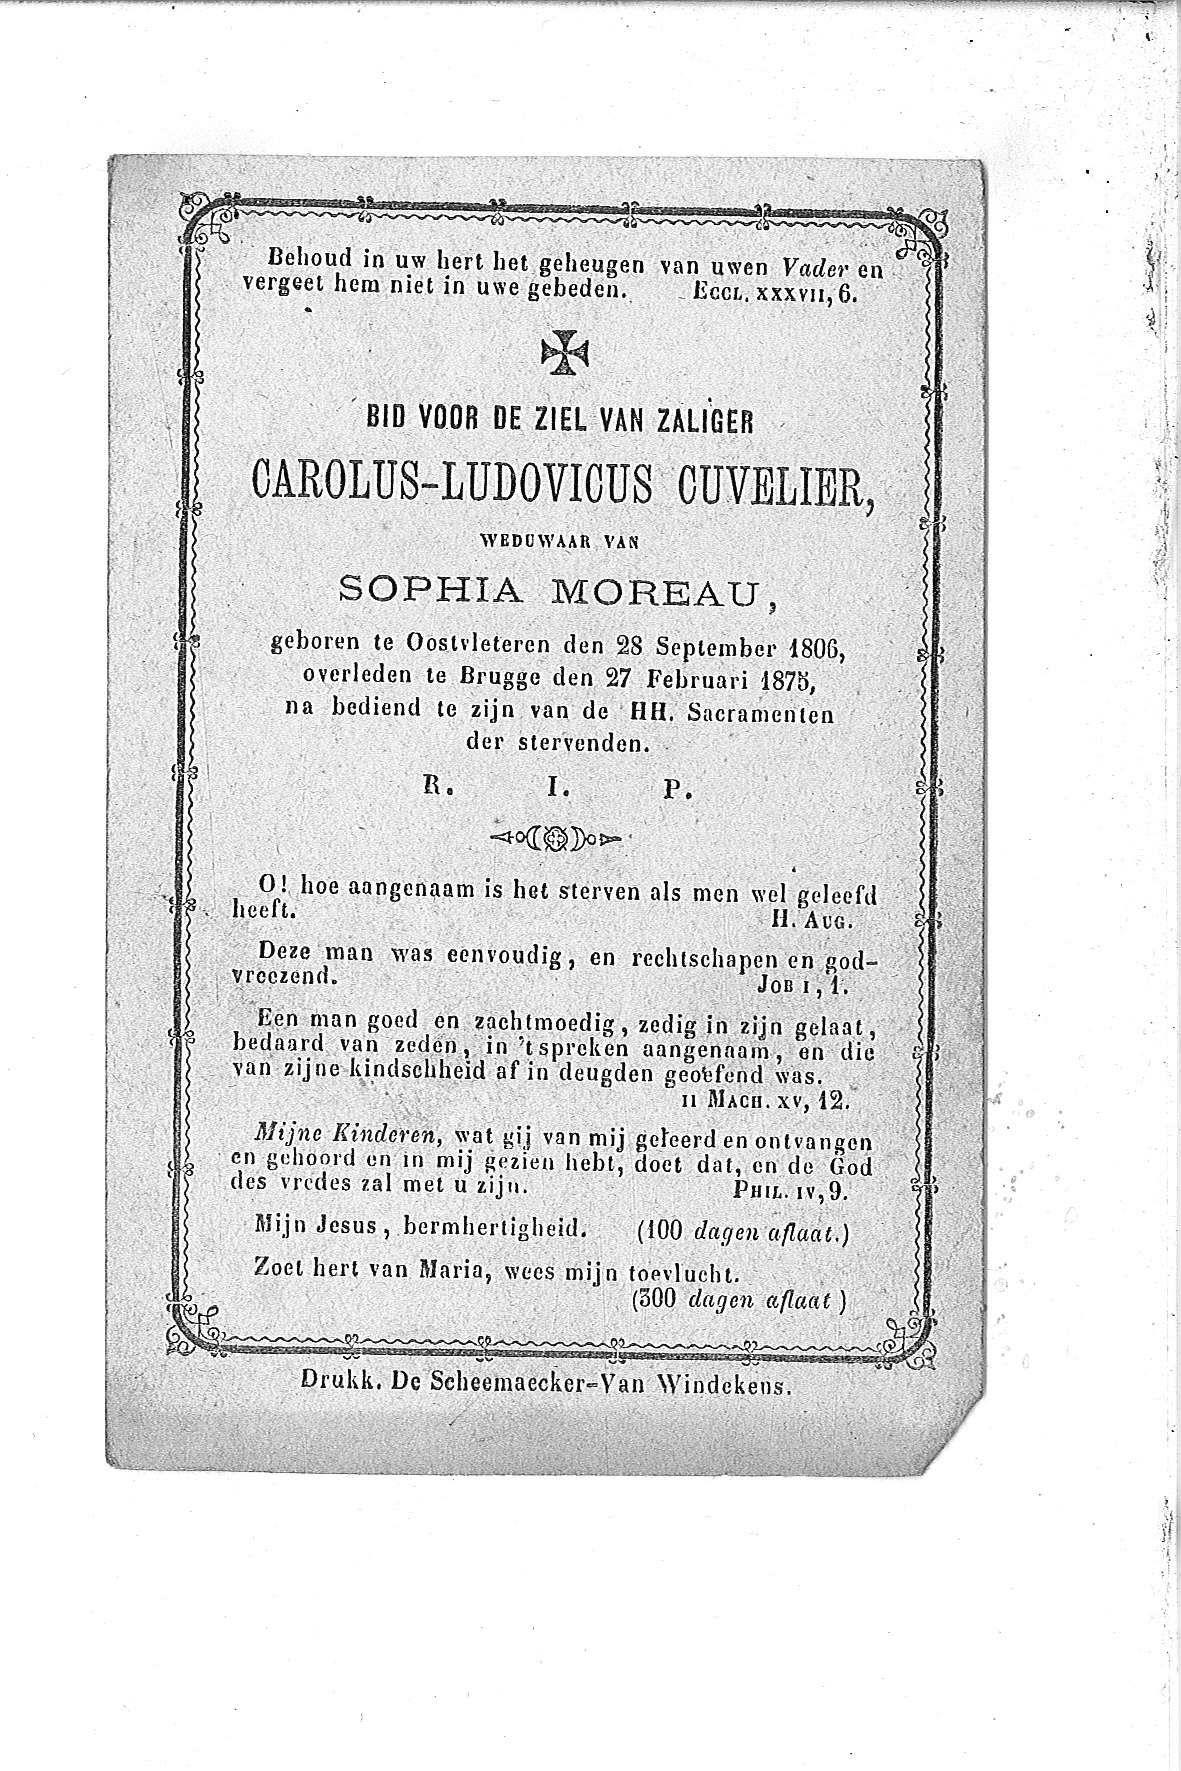 Carolus-Ludovicus (1875) 20120117161928_00187.jpg